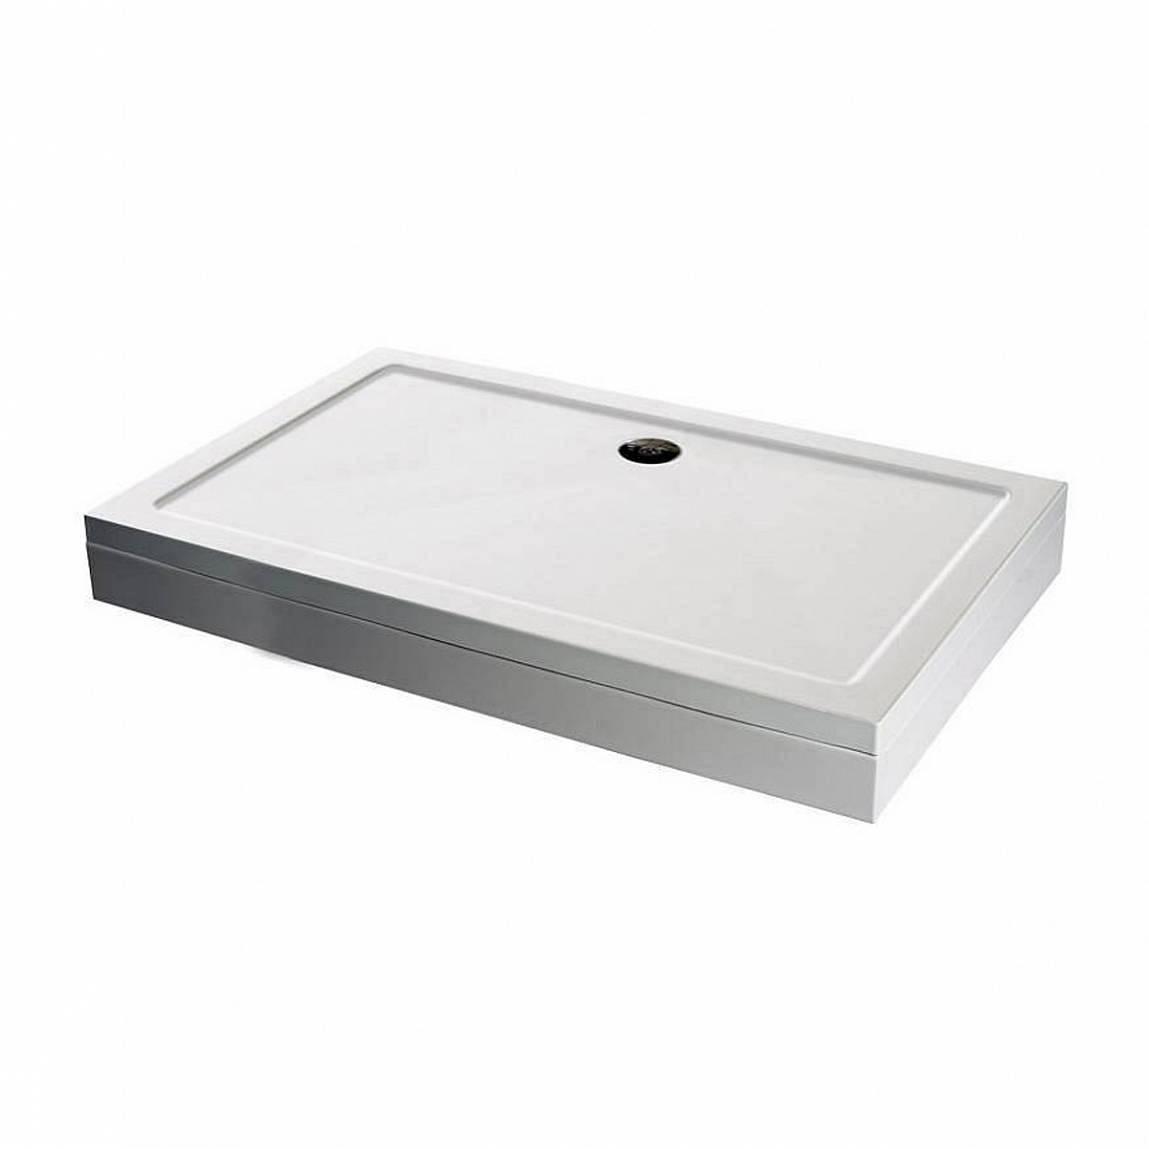 Image of Rectangular Stone Shower Tray & Riser Kit 1200 x 700